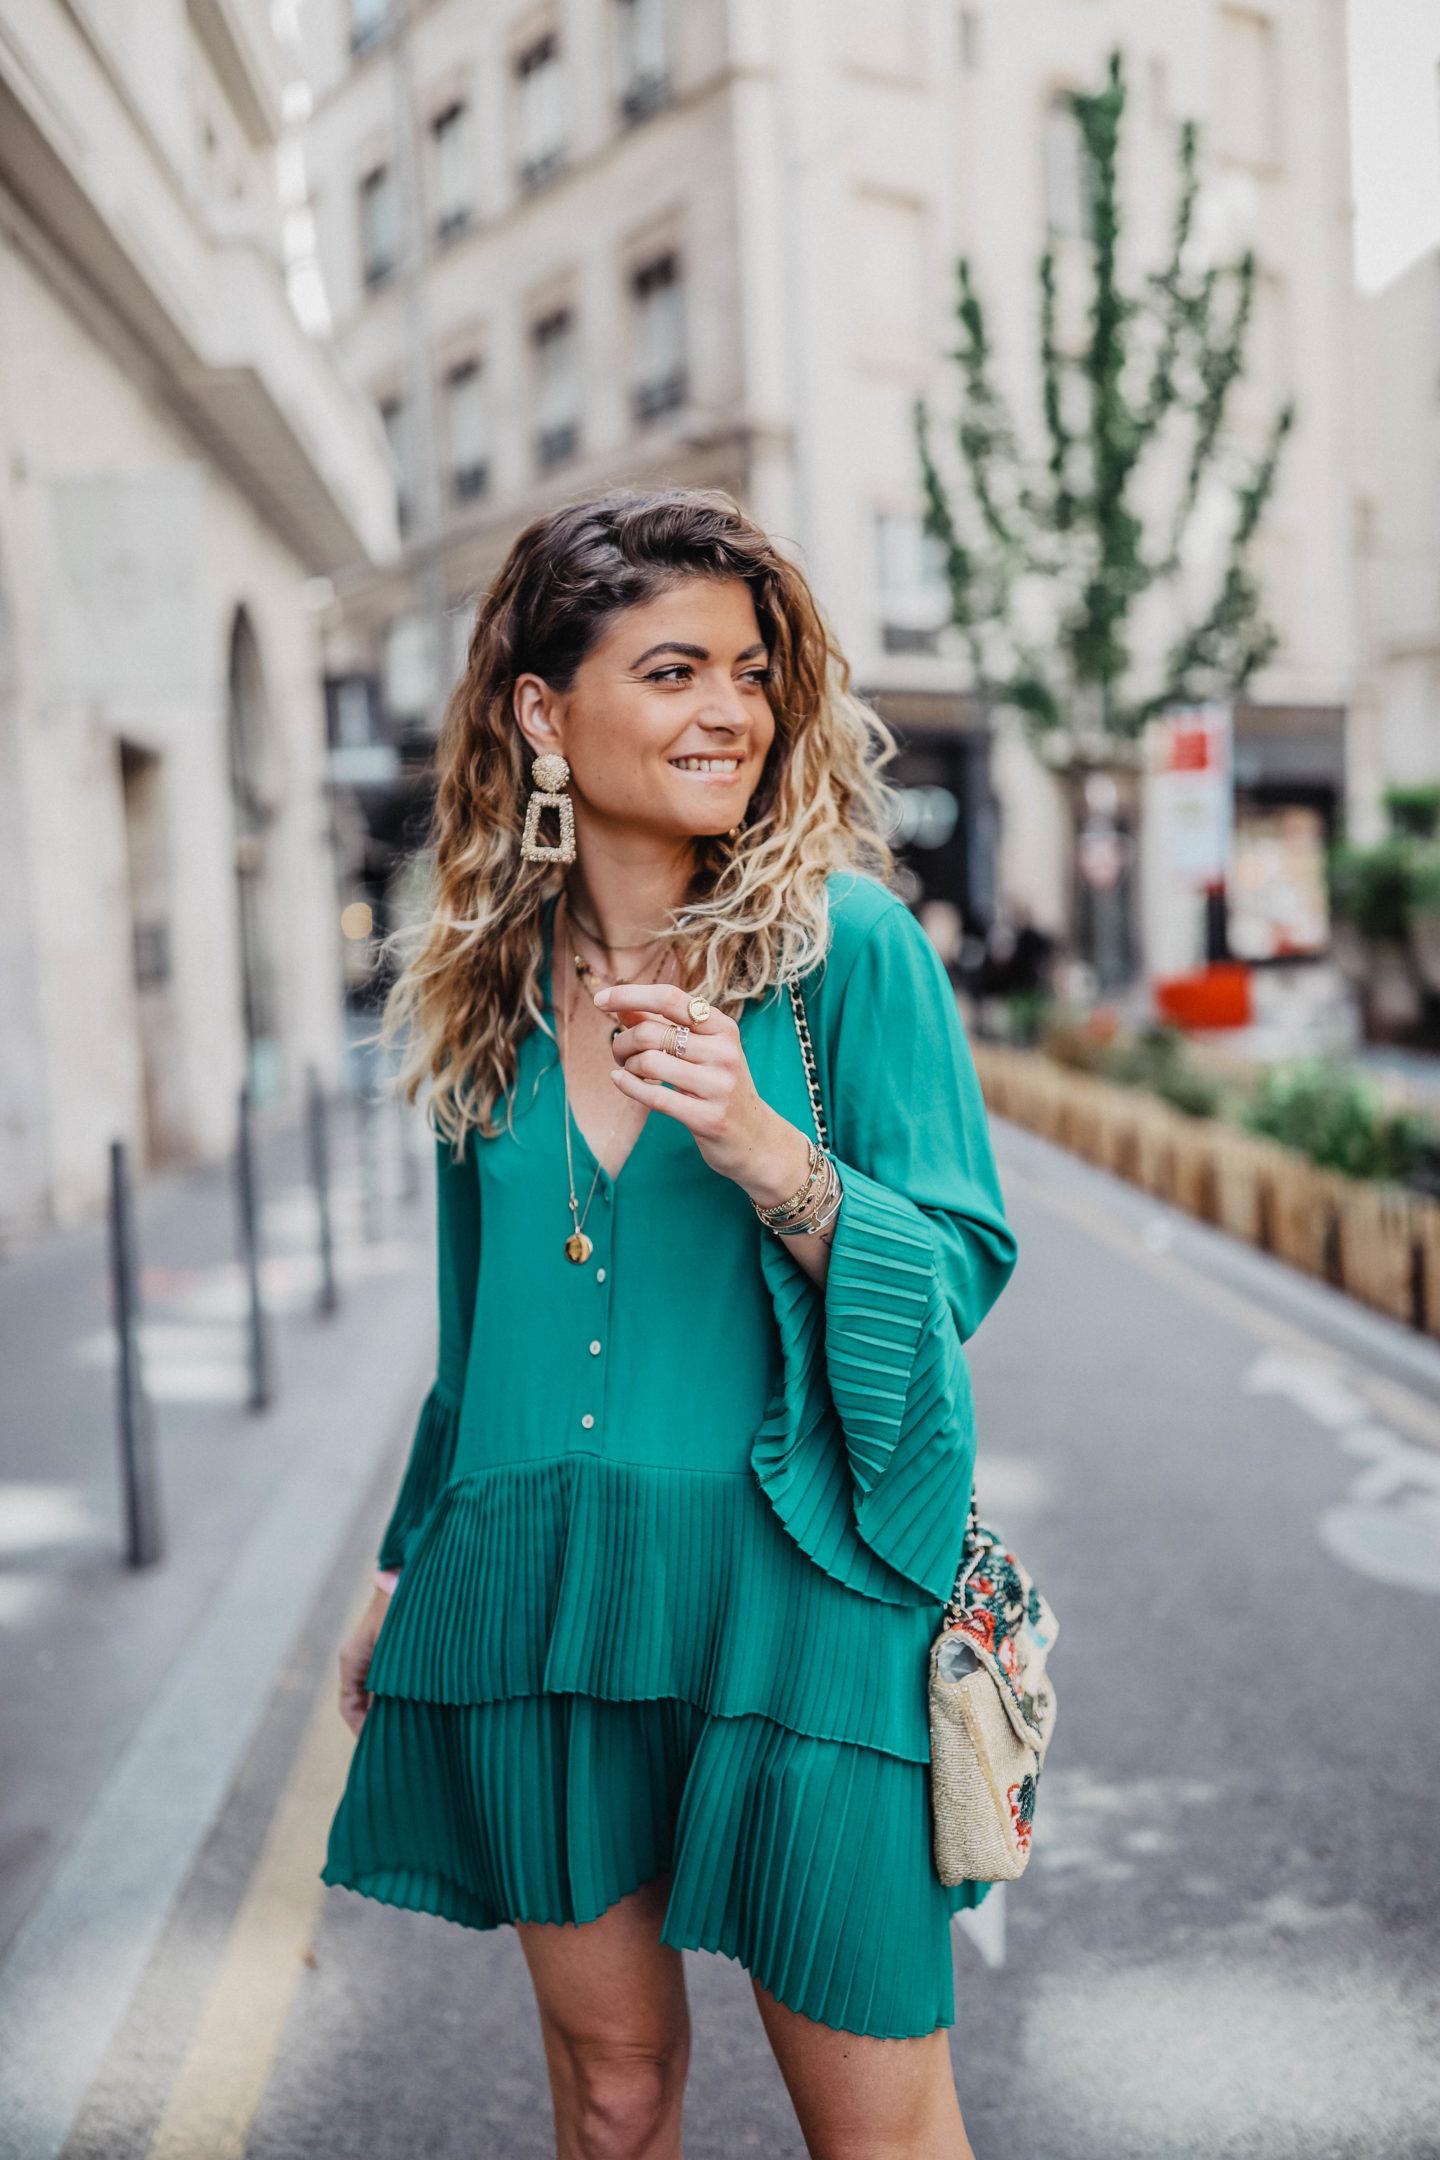 Robe verte Zara marie and mood blog mode